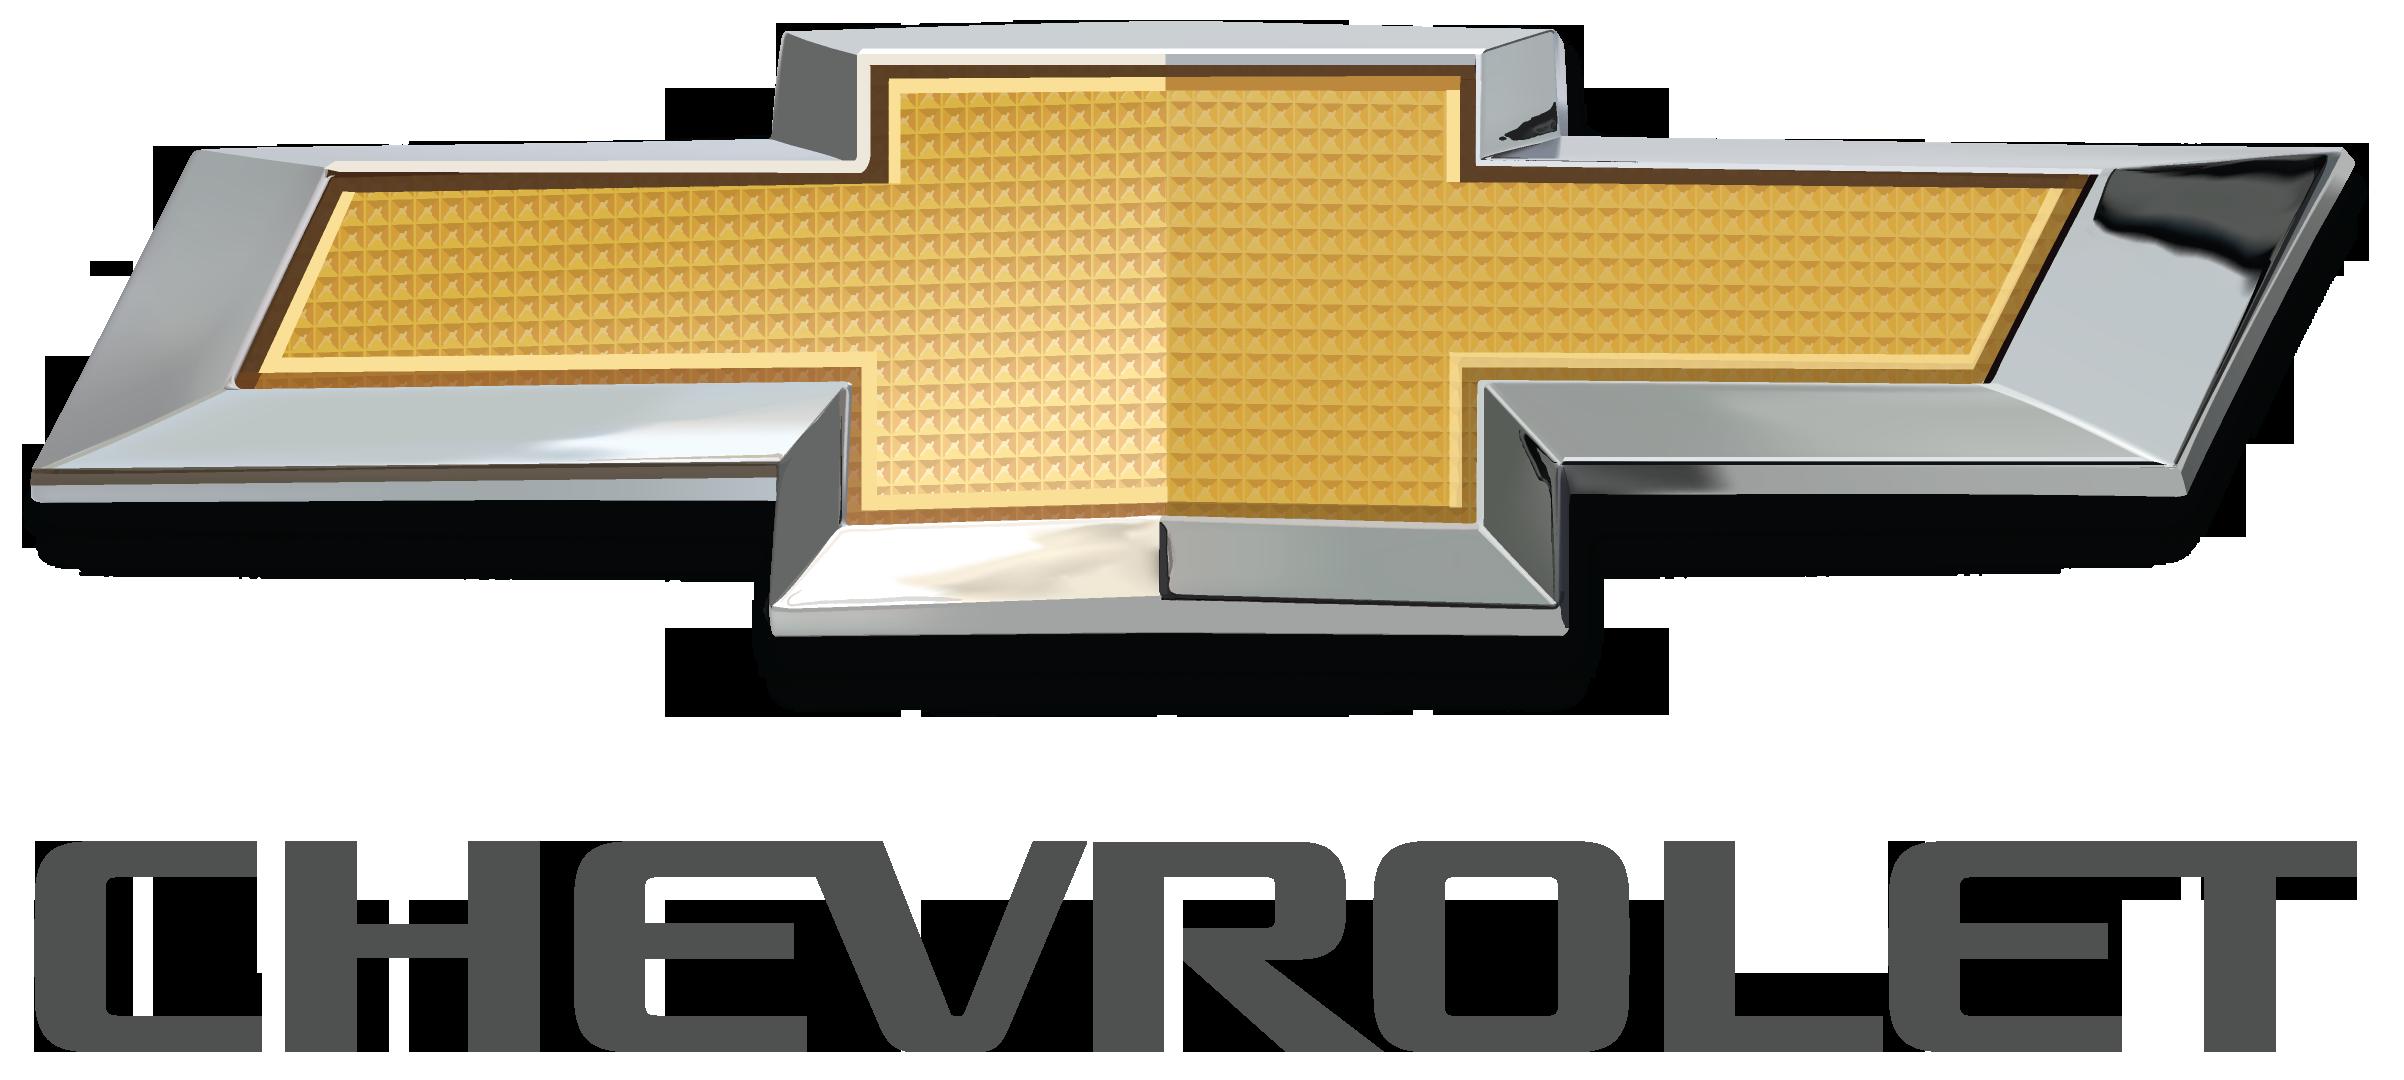 Download Free Png ?【chevrolet Logo】| Chevrolet Logo Design Pluspng.com  - Chevrolet Logo PNG